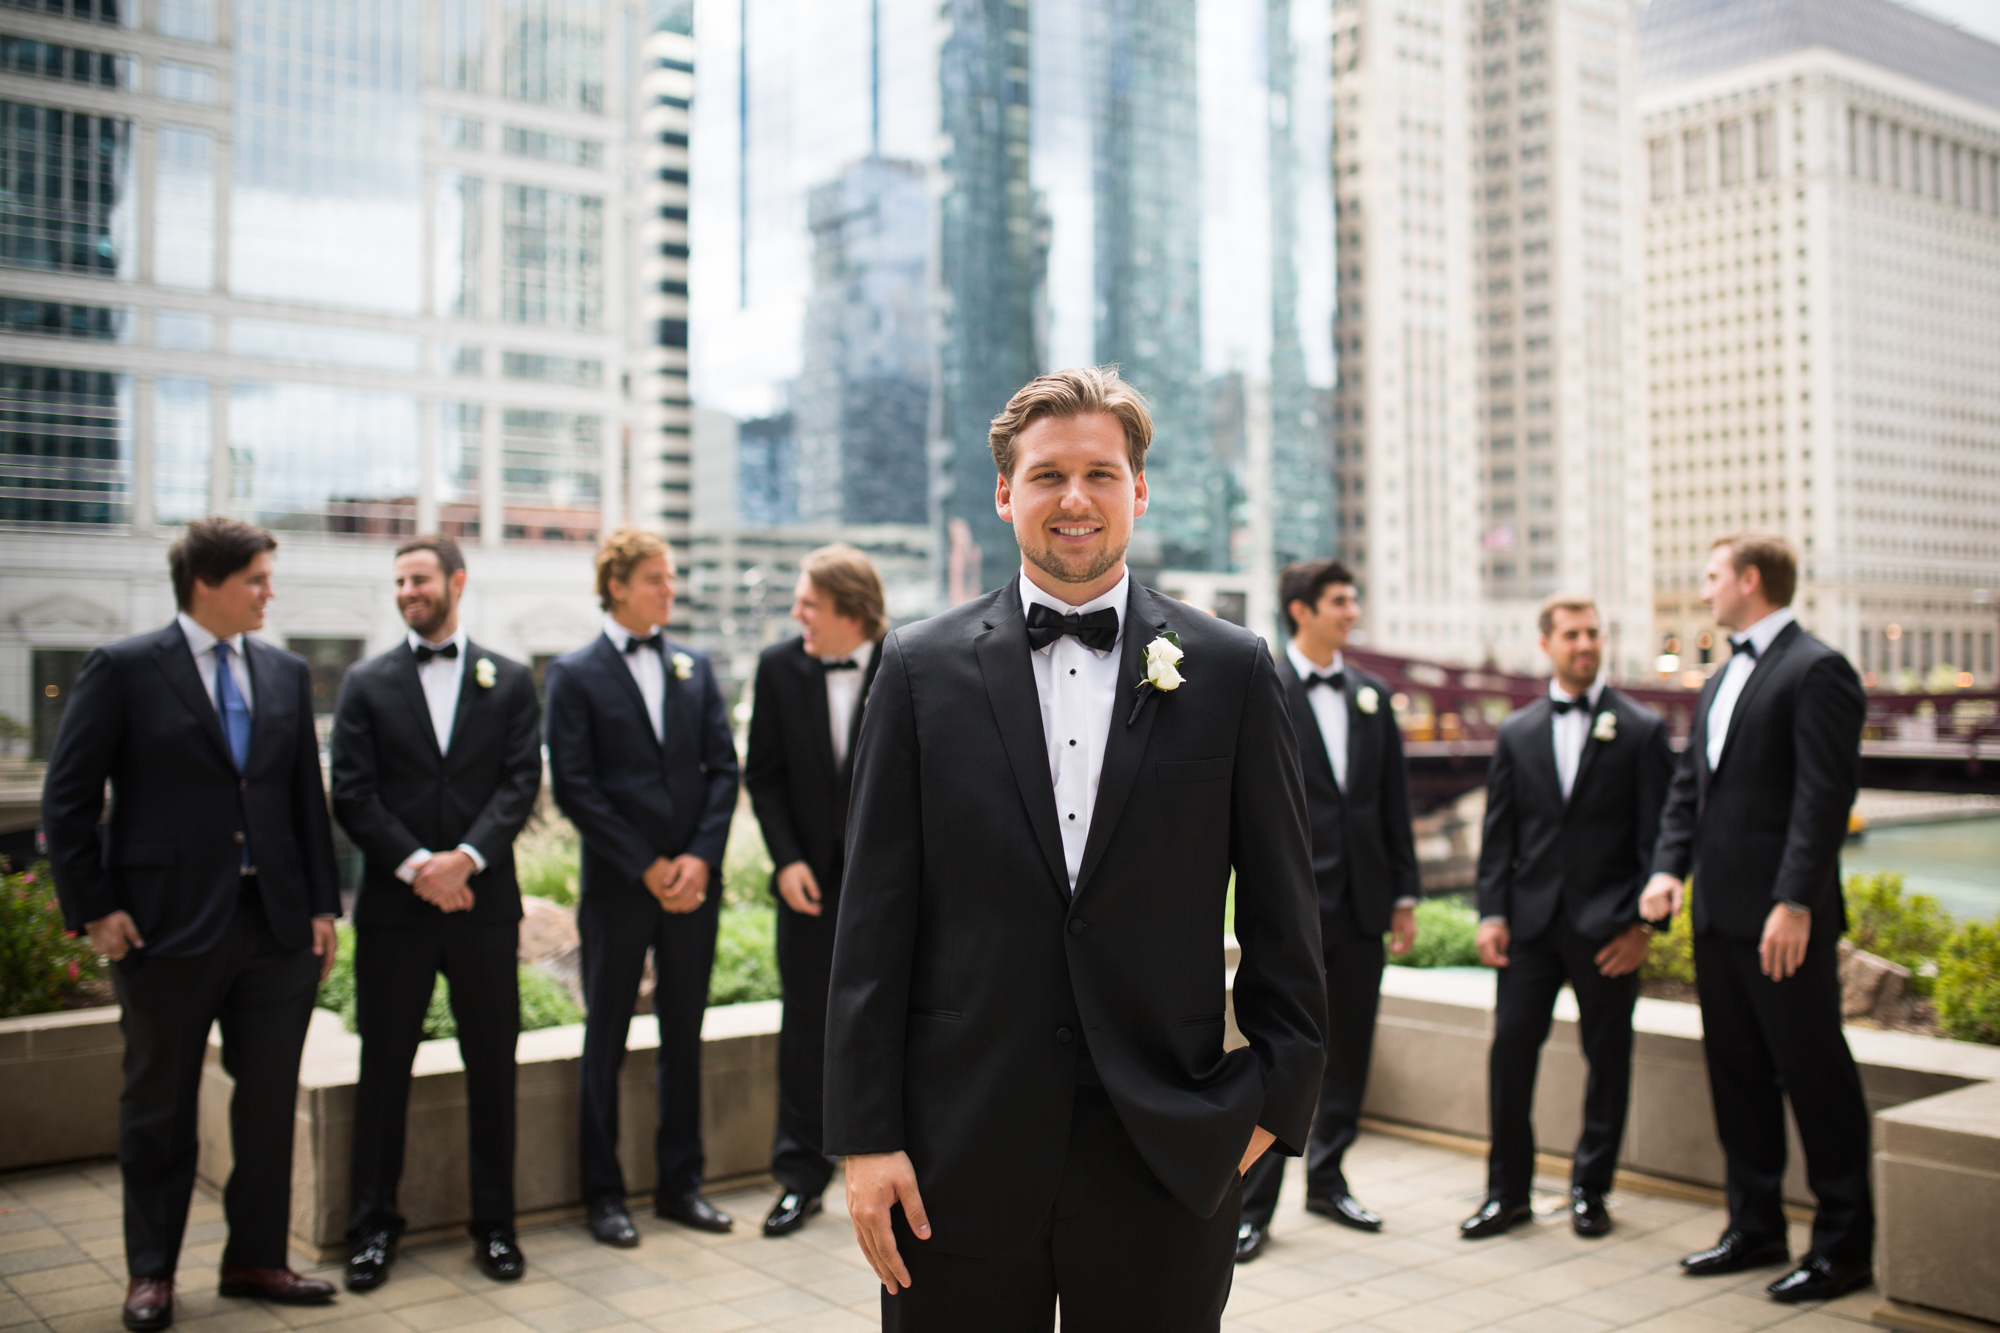 Groom and groomsmen portrait against Chicago skyline.